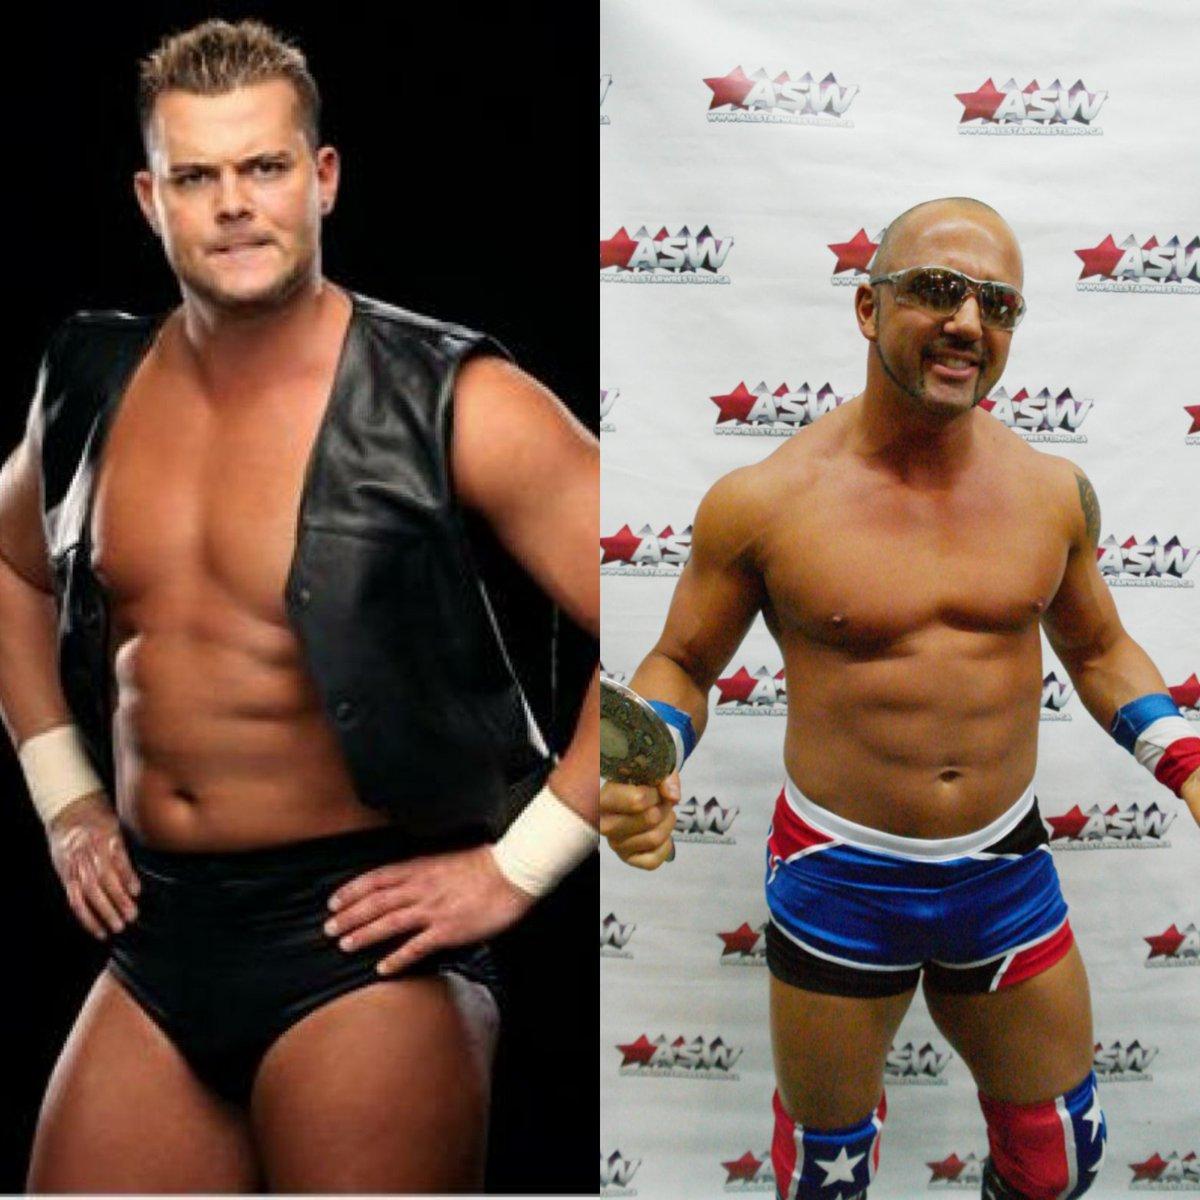 One Week again! in @CREA_Fairground Stu Hart Heritage Title  @DBSmithjr (Champion) vs @ChrisRyseck #ASW #Wrestler #wrestling #surreybc<br>http://pic.twitter.com/iZB8nopOqI